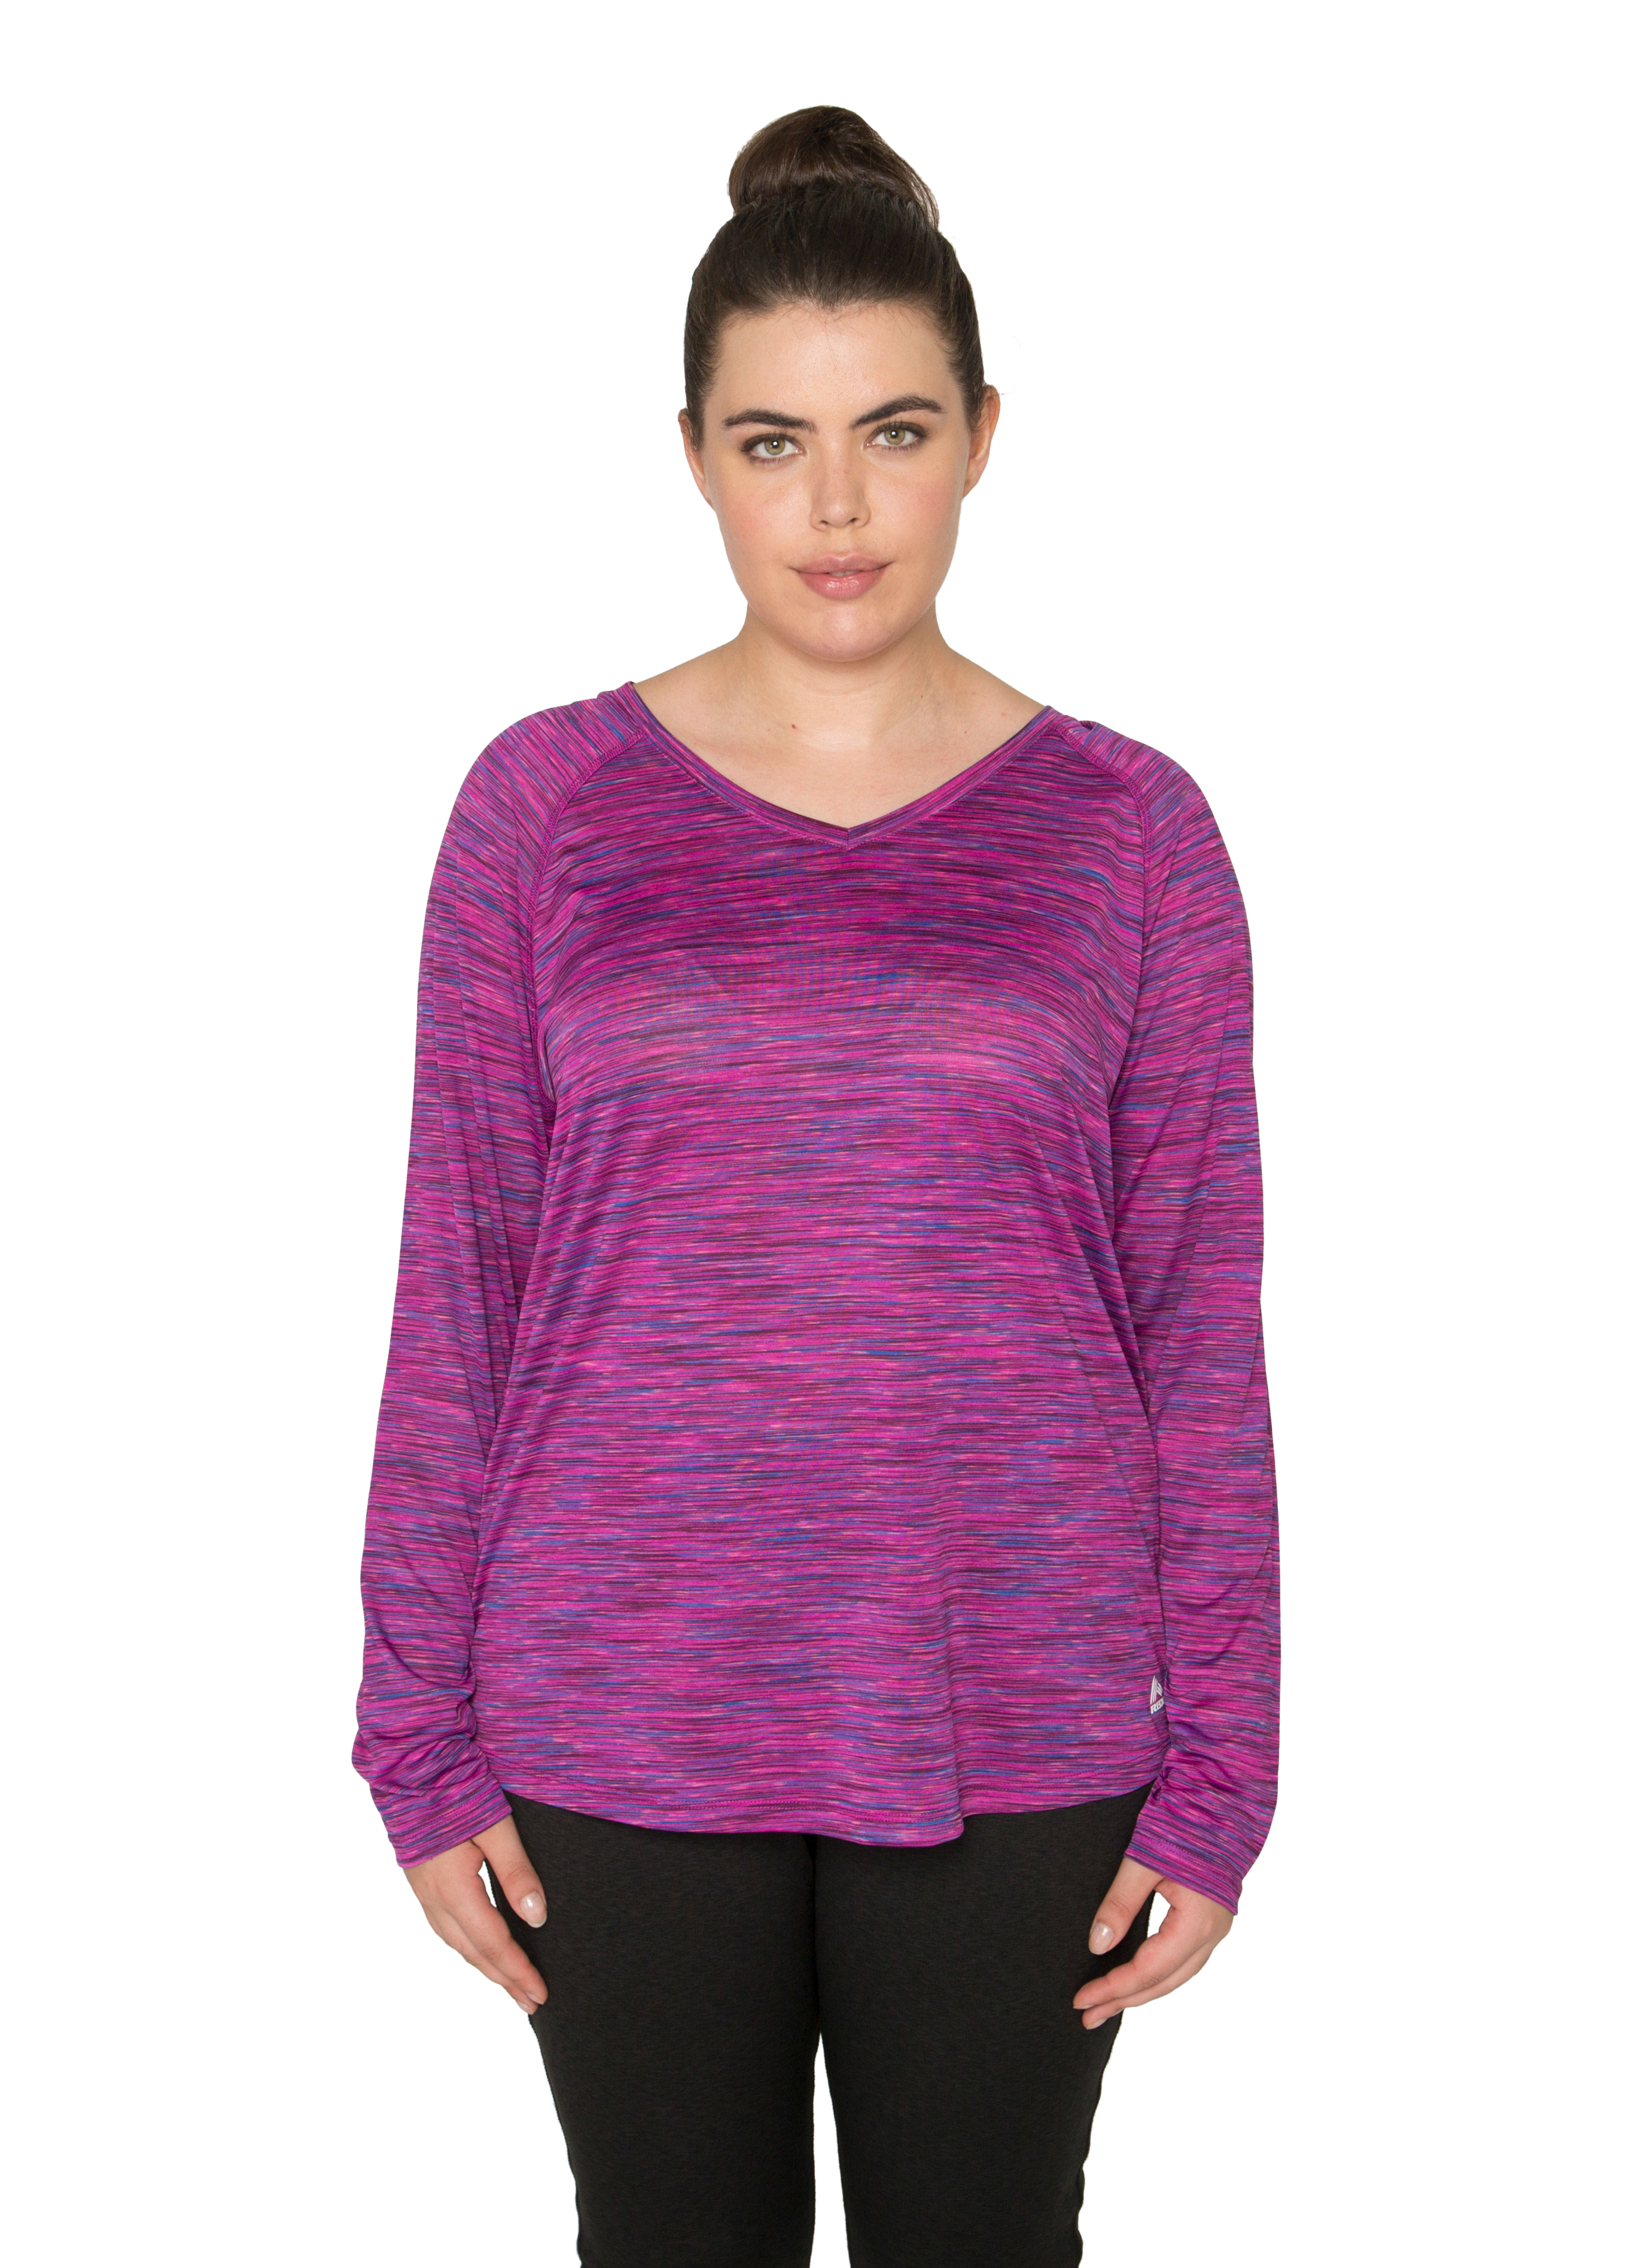 RBX Active Women's Plus Size Space Dye Long Sleeve Lightweight V-Neck Running Shirt